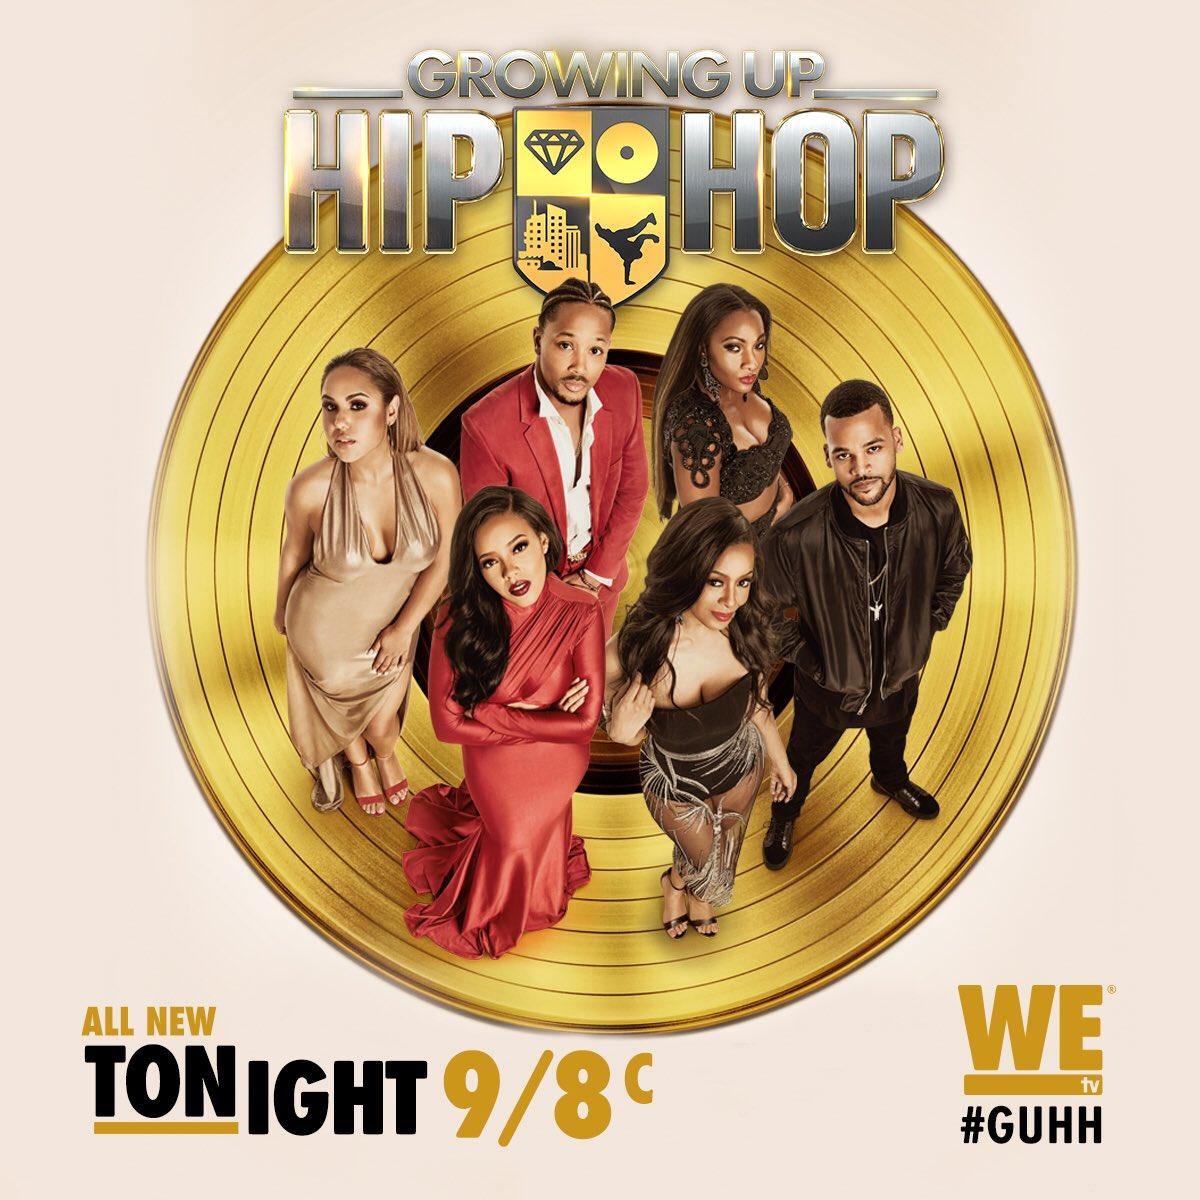 Watch #guhh tonight @9/8 C on @WEtv https://t.co/QCCAGdOlND